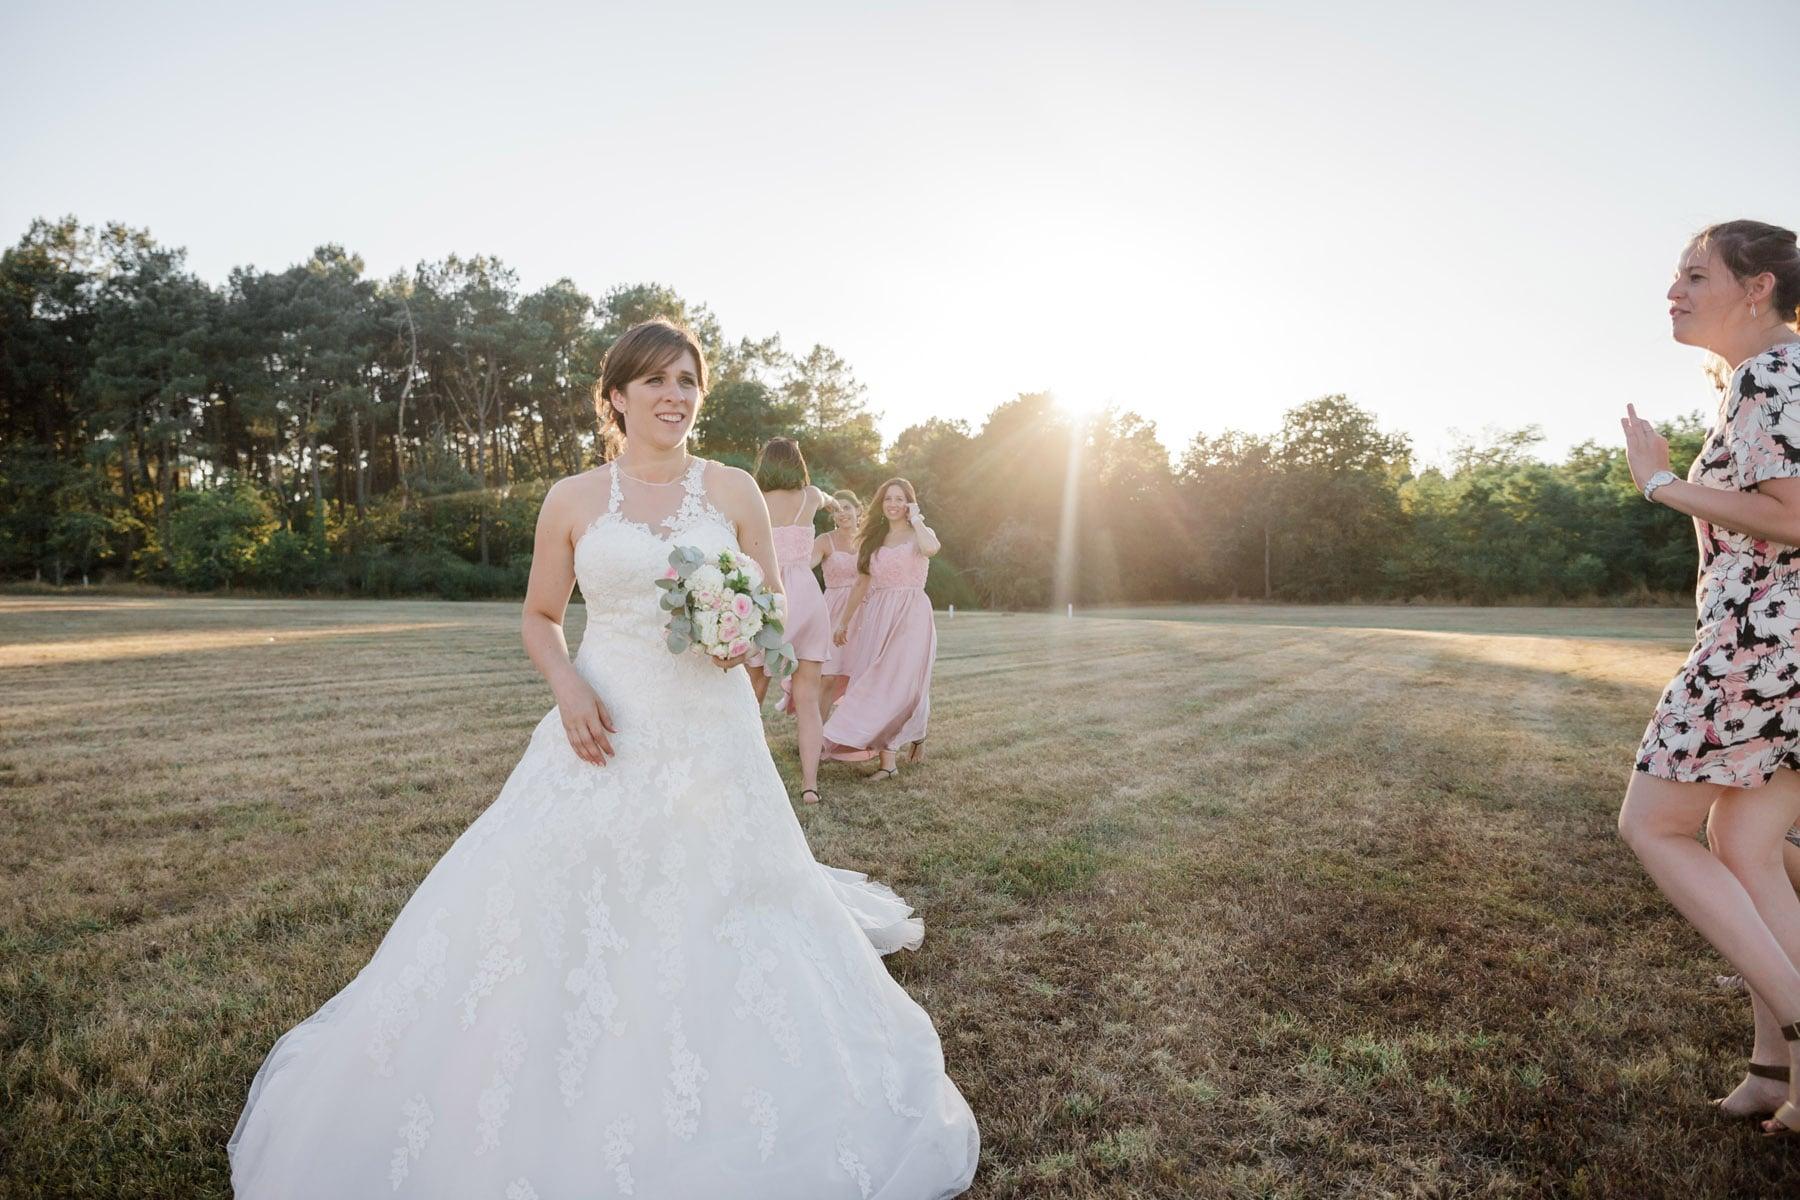 photographe mariage bordeaux landes fineart francais sarah miramon blog 39